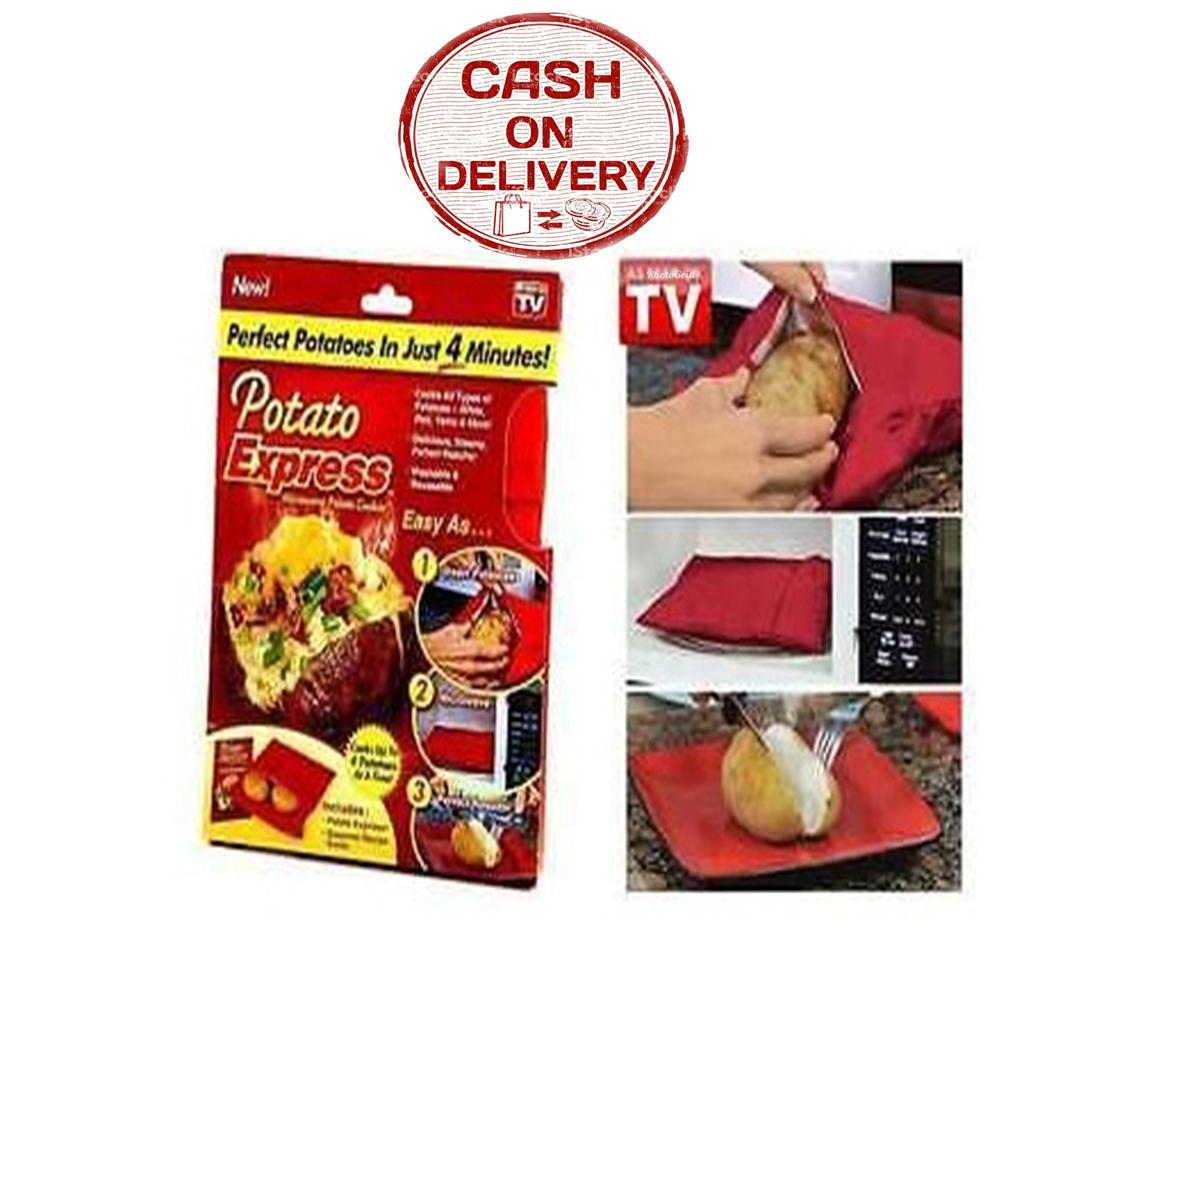 Sien Collection Potato Express Microwave / Potato Cooker / Potato Express / Oven Kentang / Pembungkus Kentang Murah